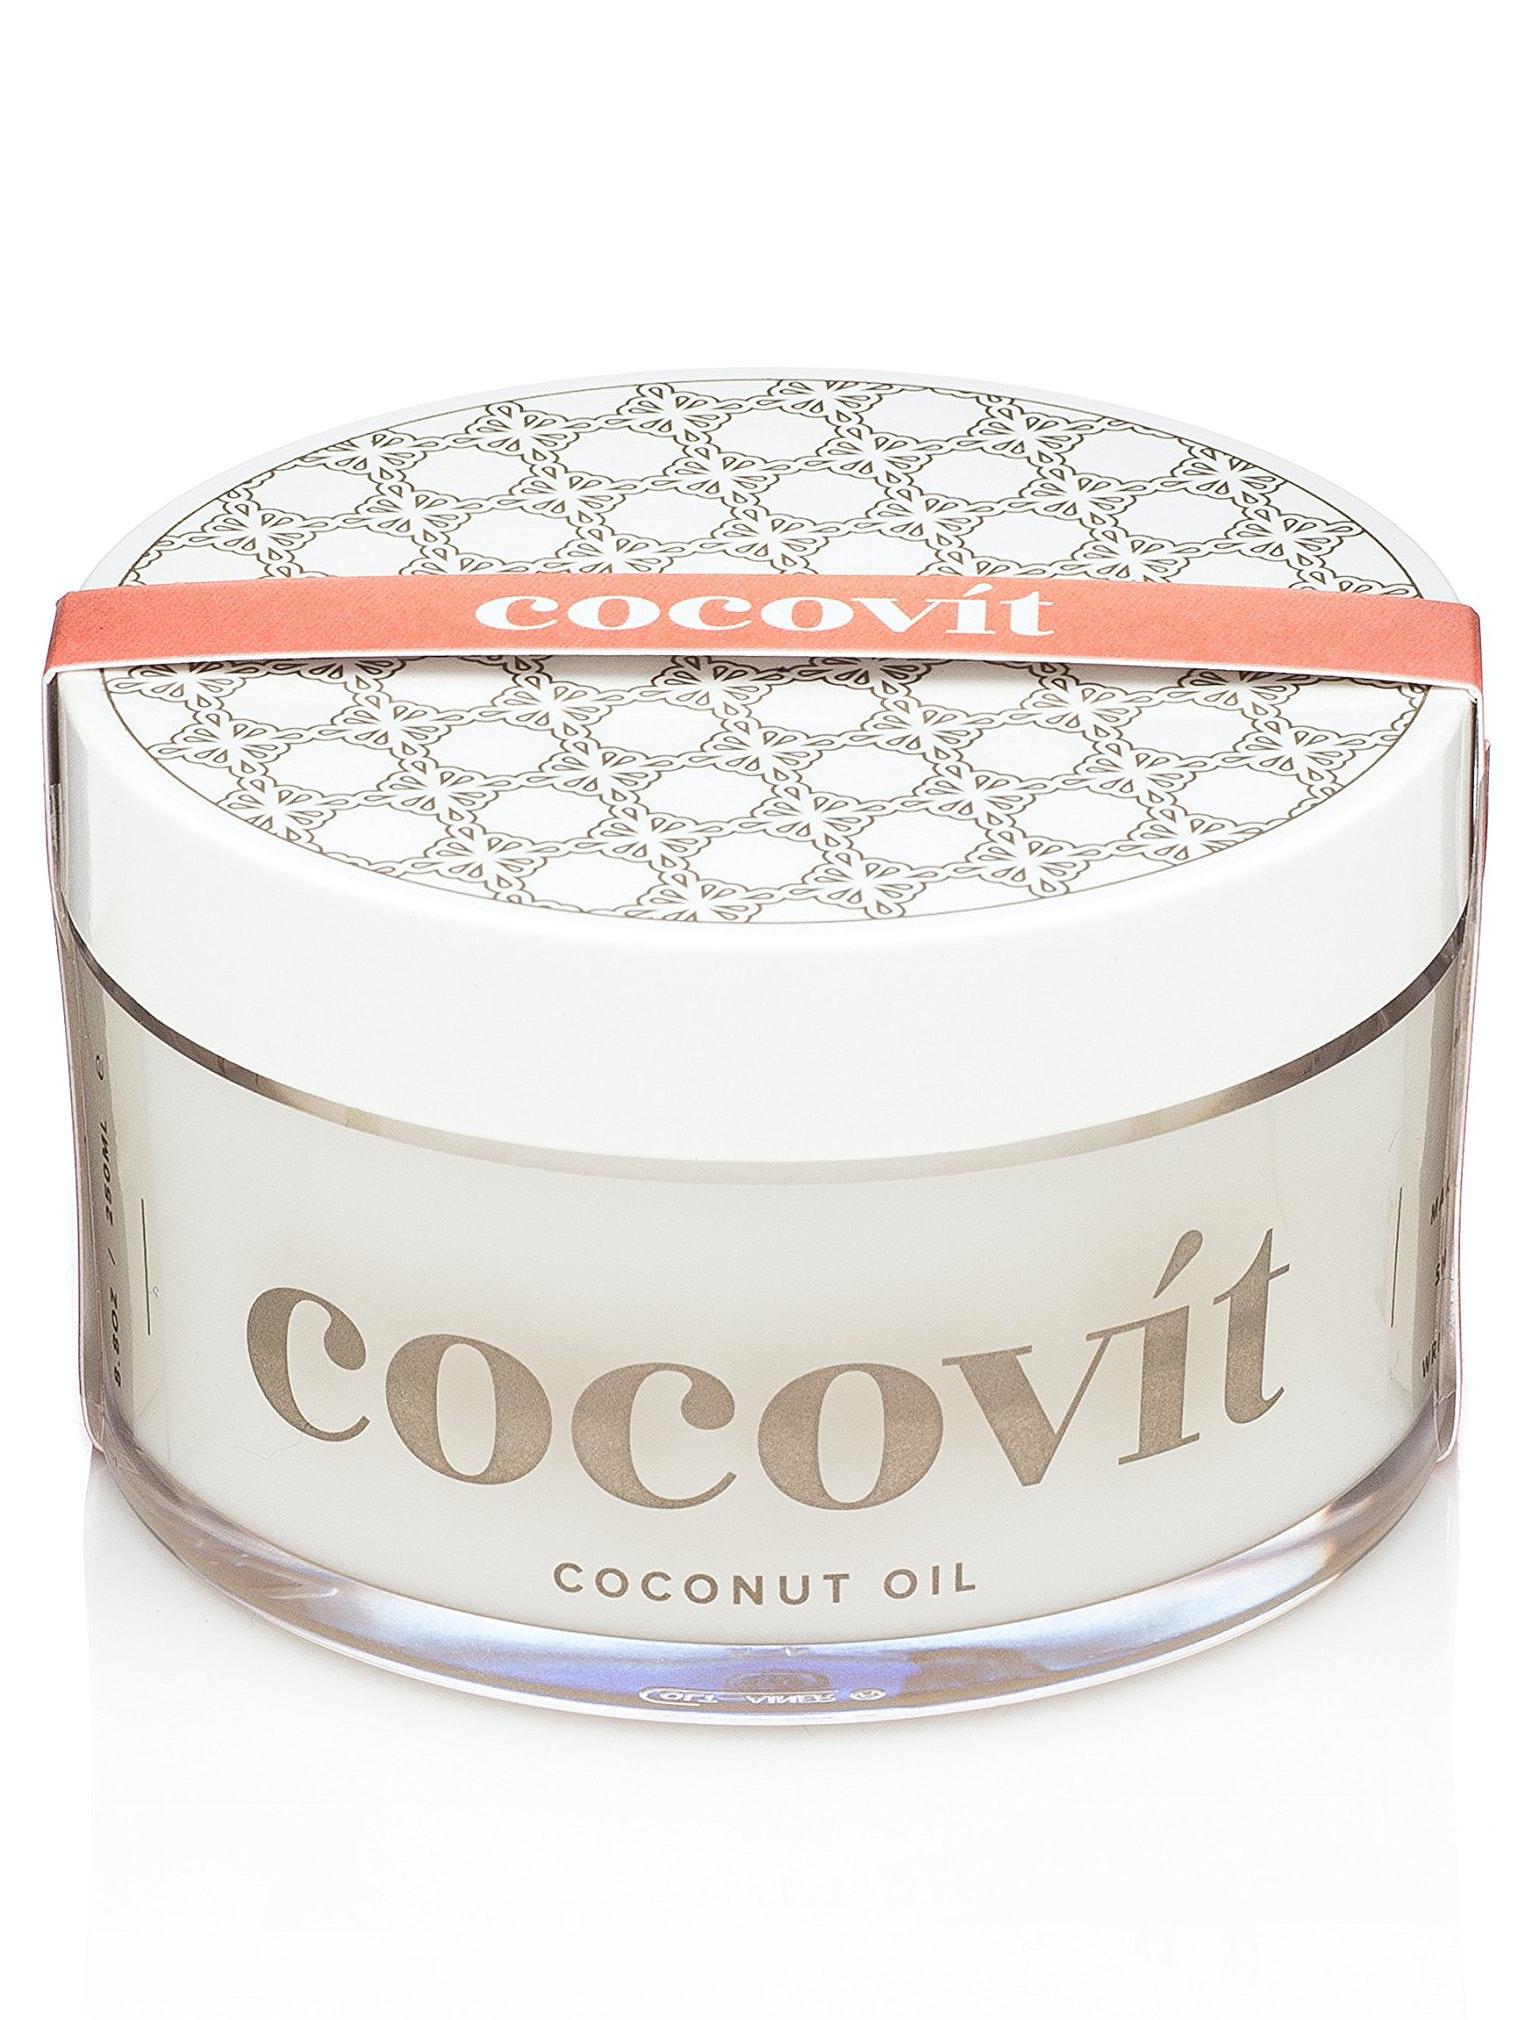 Cocovít Beauty Coconut Oil